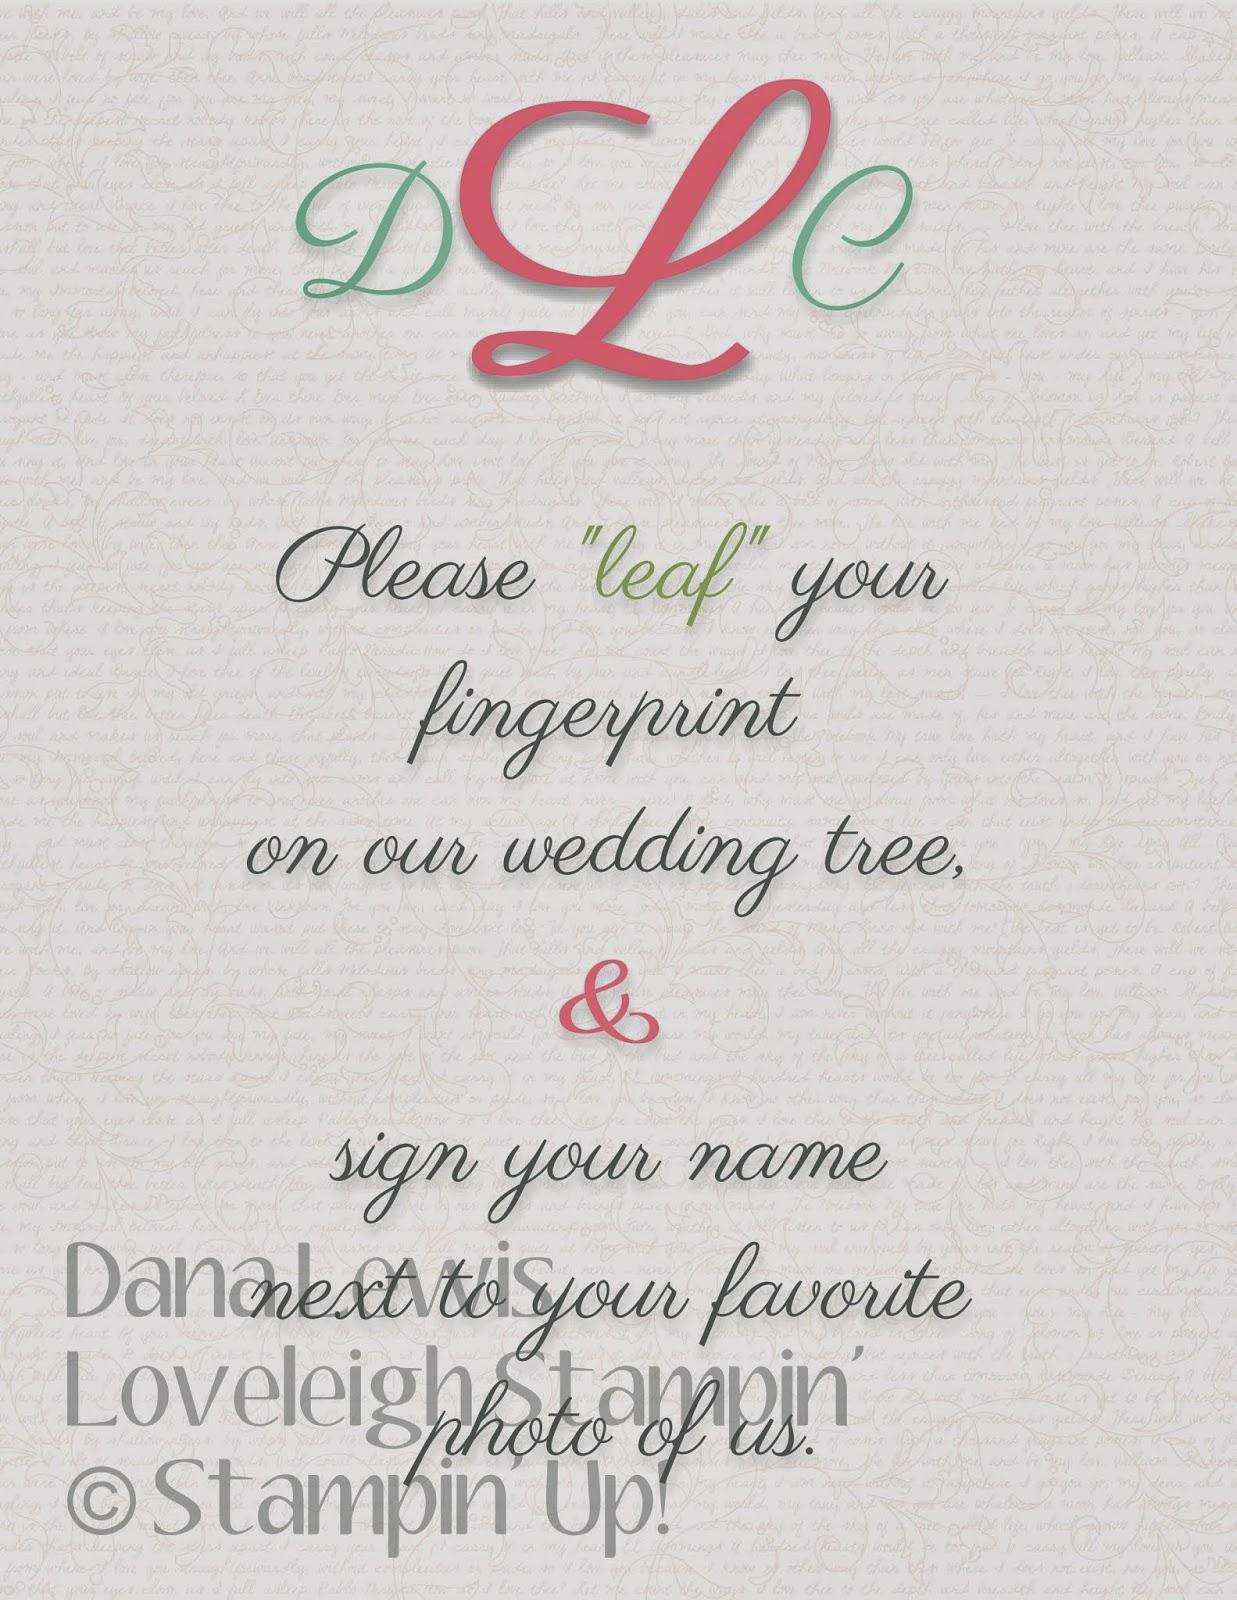 Loveleigh stampin wedding series day 4 guest book wedding series day 4 guest book sciox Gallery